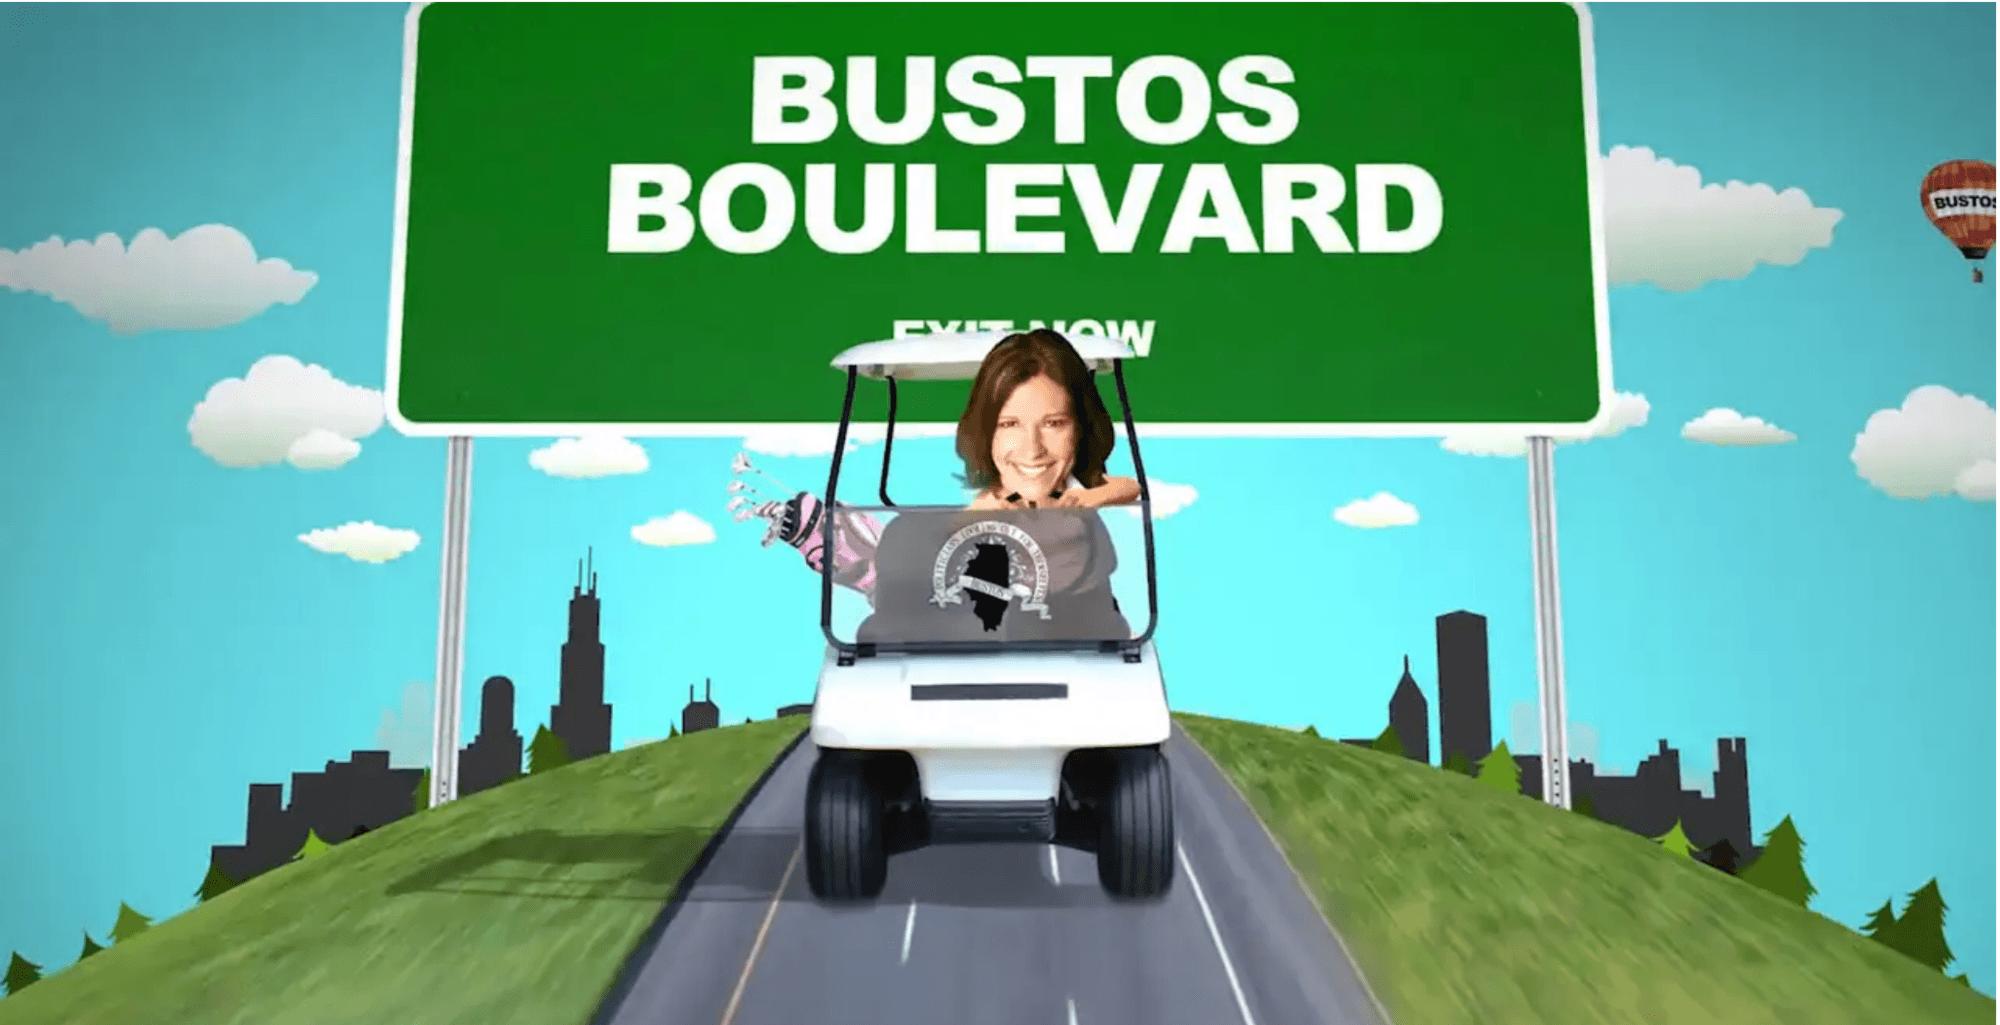 Bustos Boulevard – NRCC